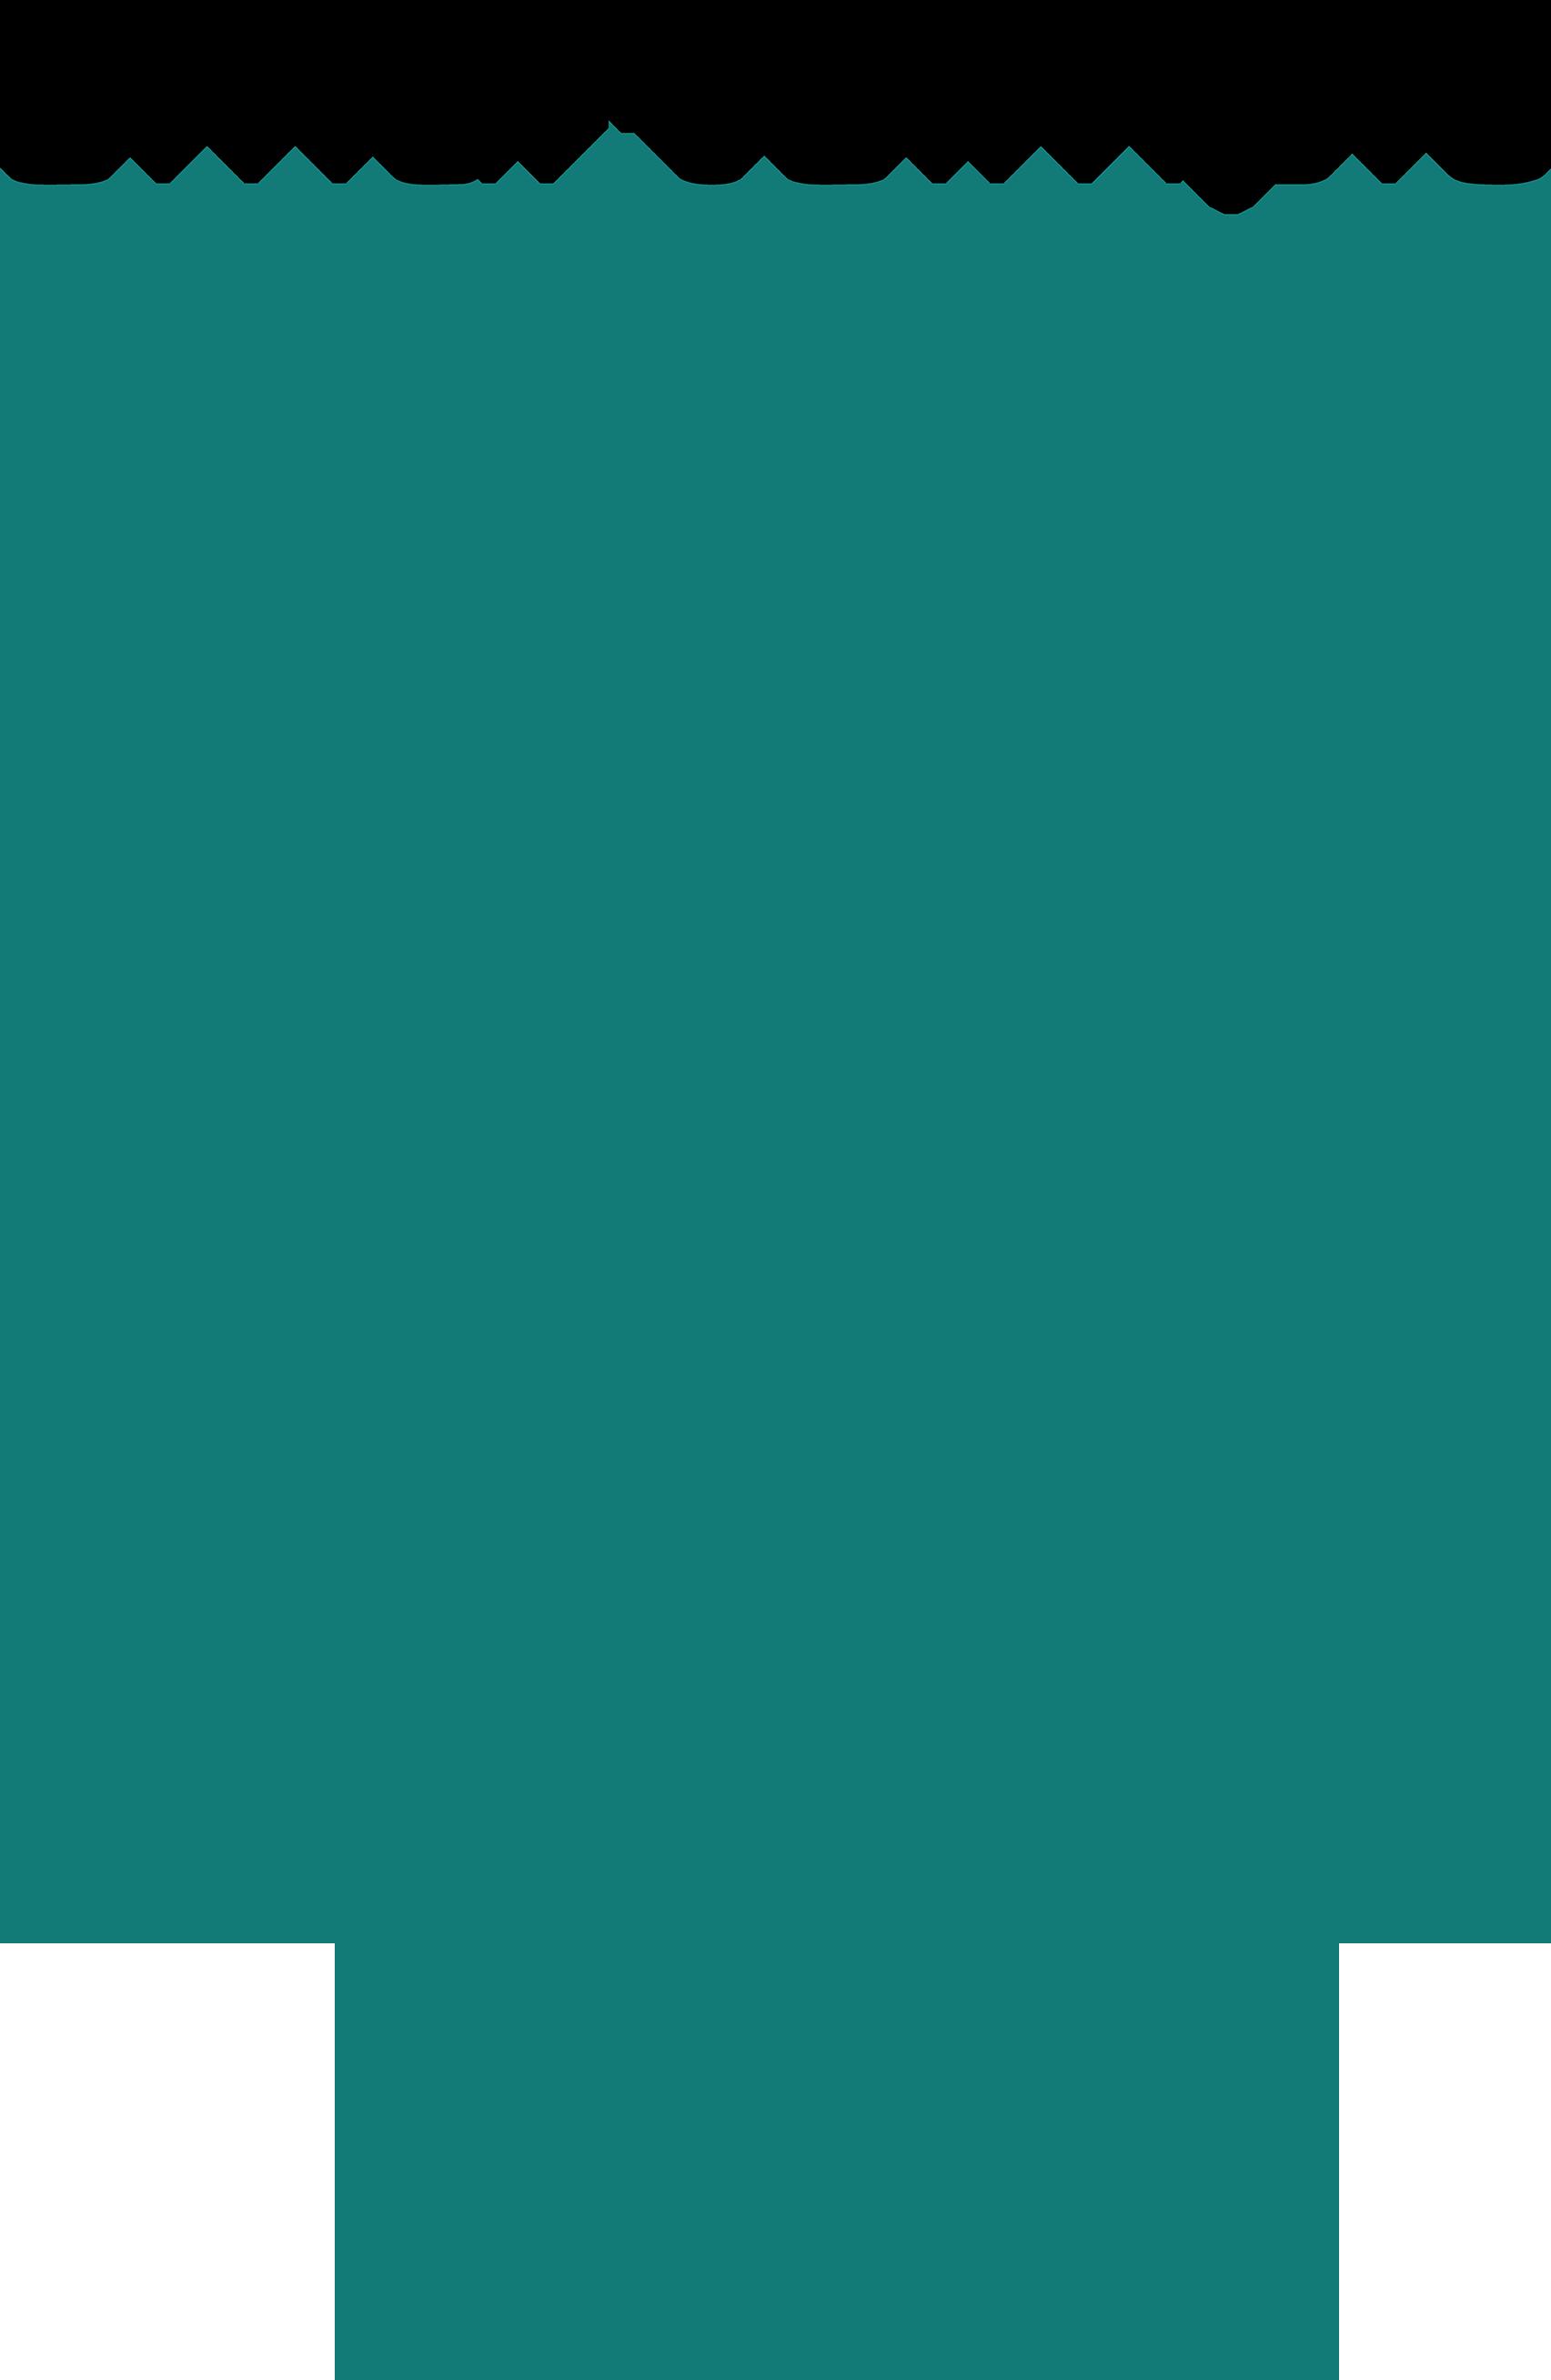 logo-24-5-FINAL-COLOR.png